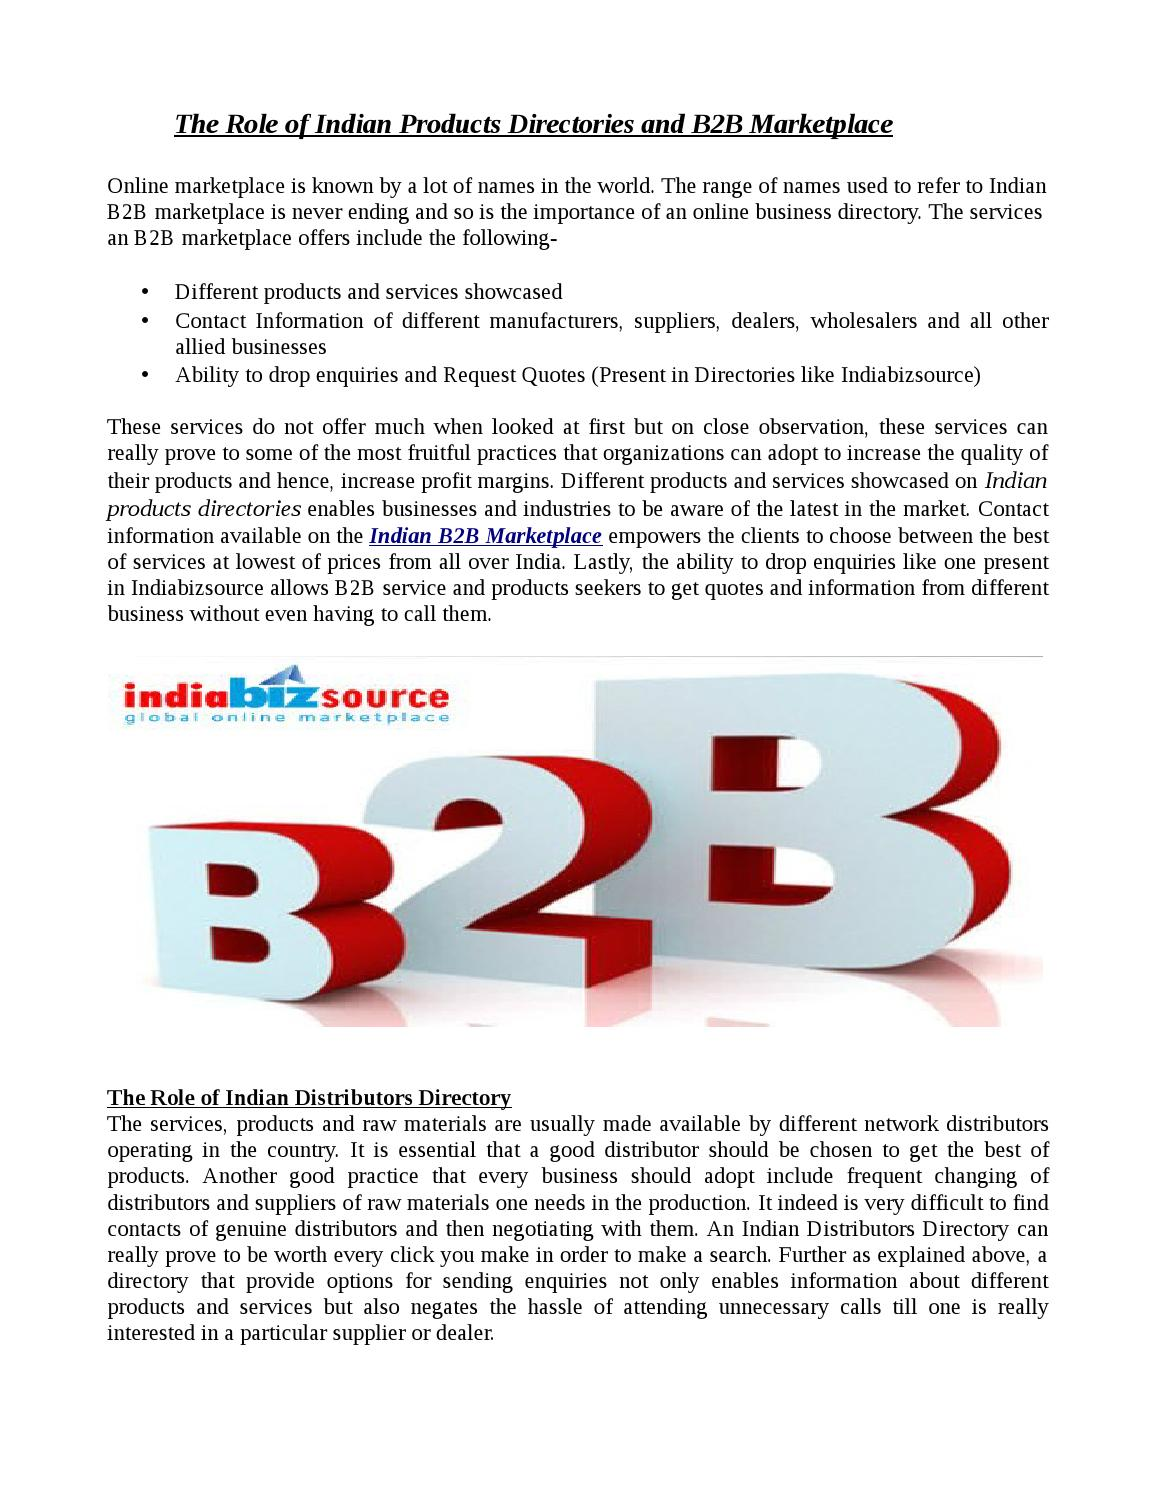 Indian b2b marketplace indian distributors directory indian